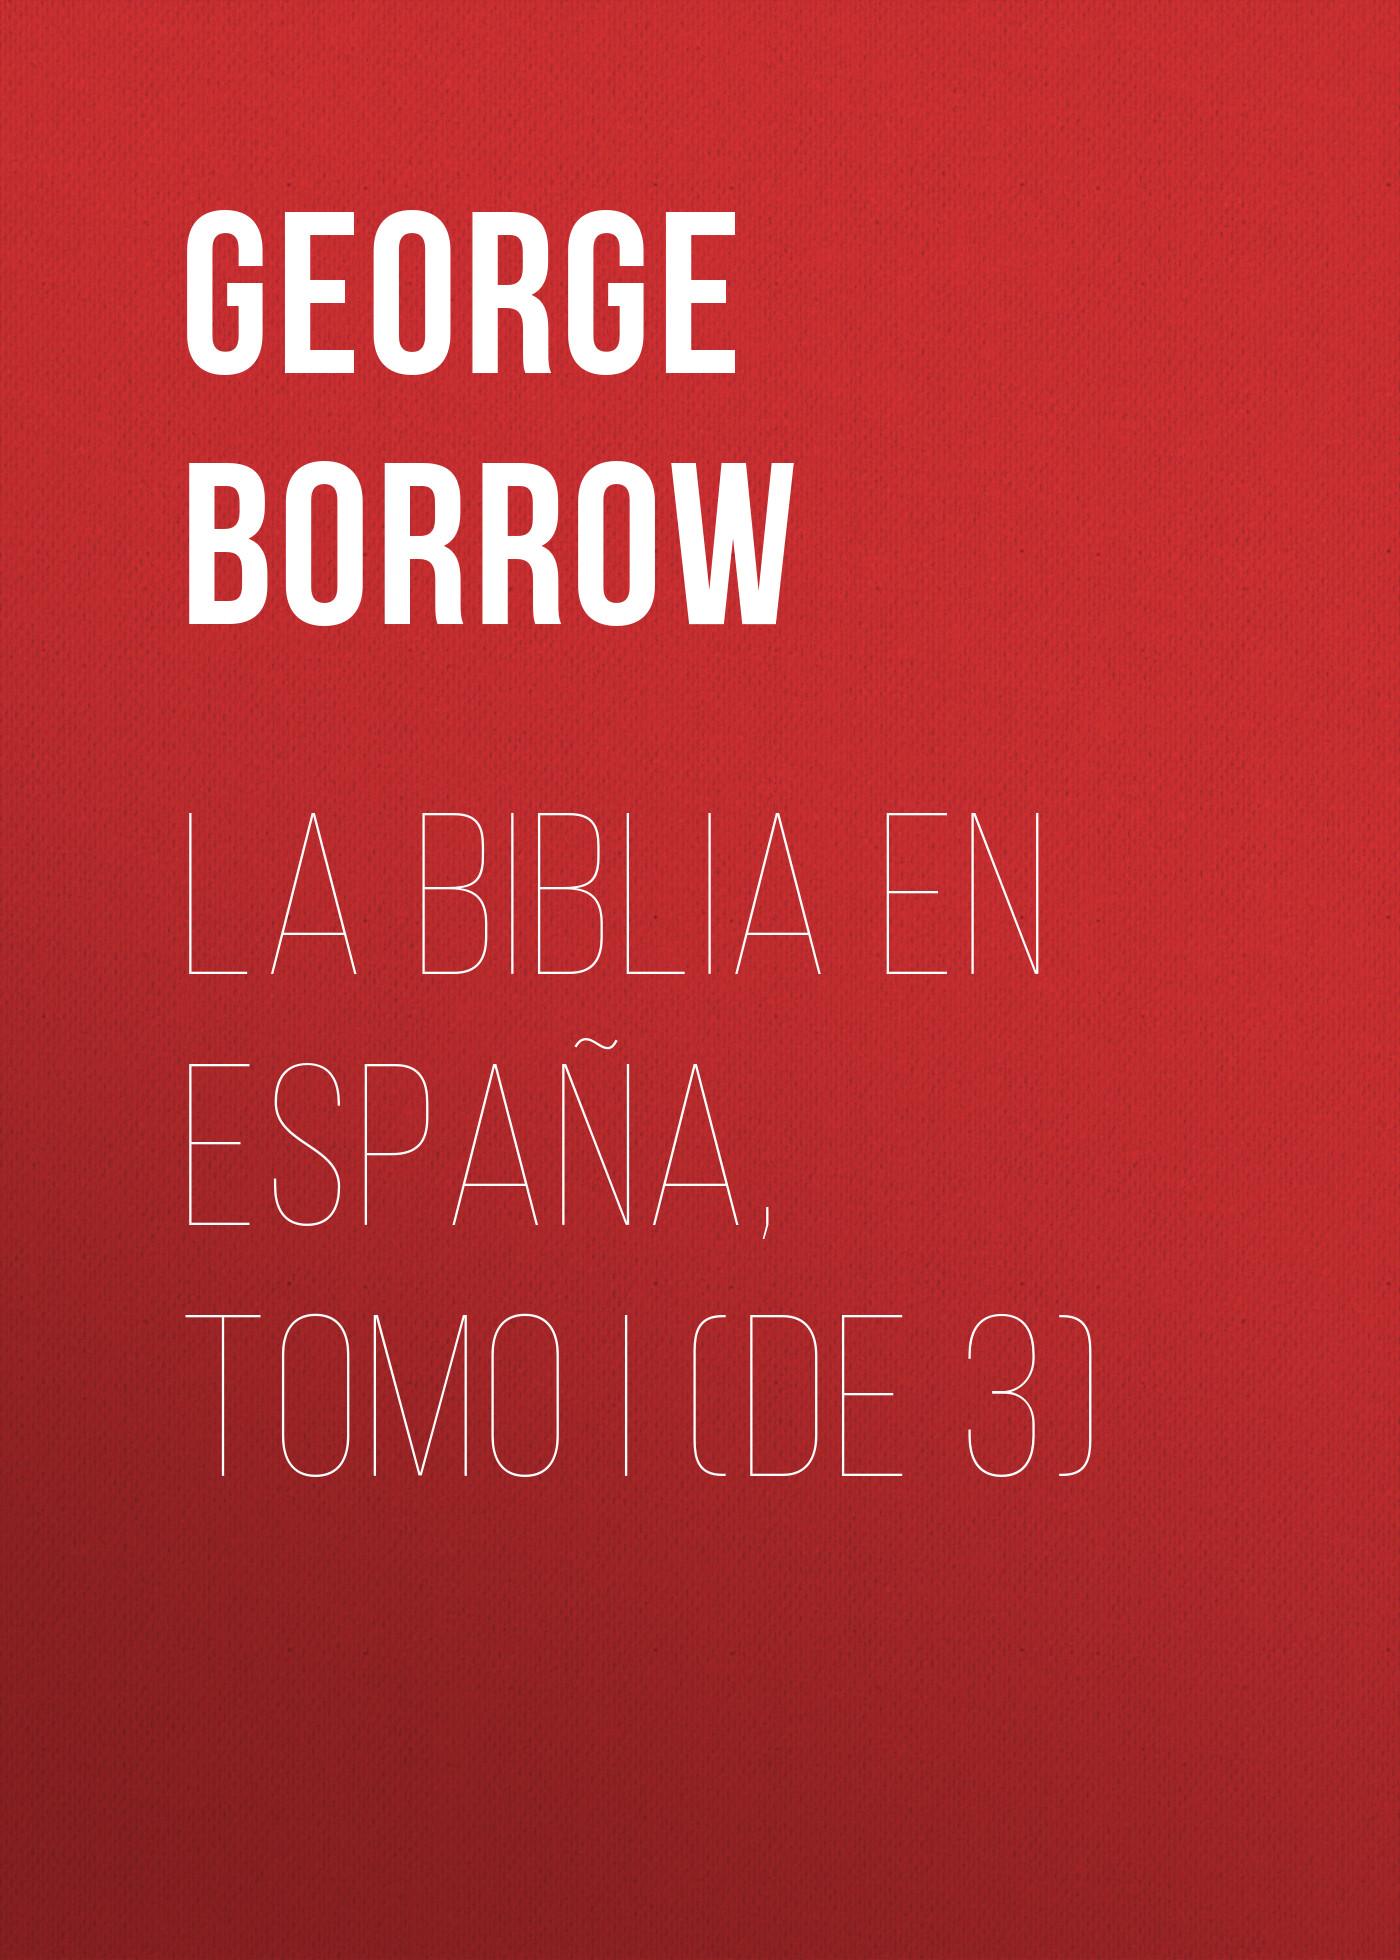 Borrow George La Biblia en España, Tomo I (de 3)